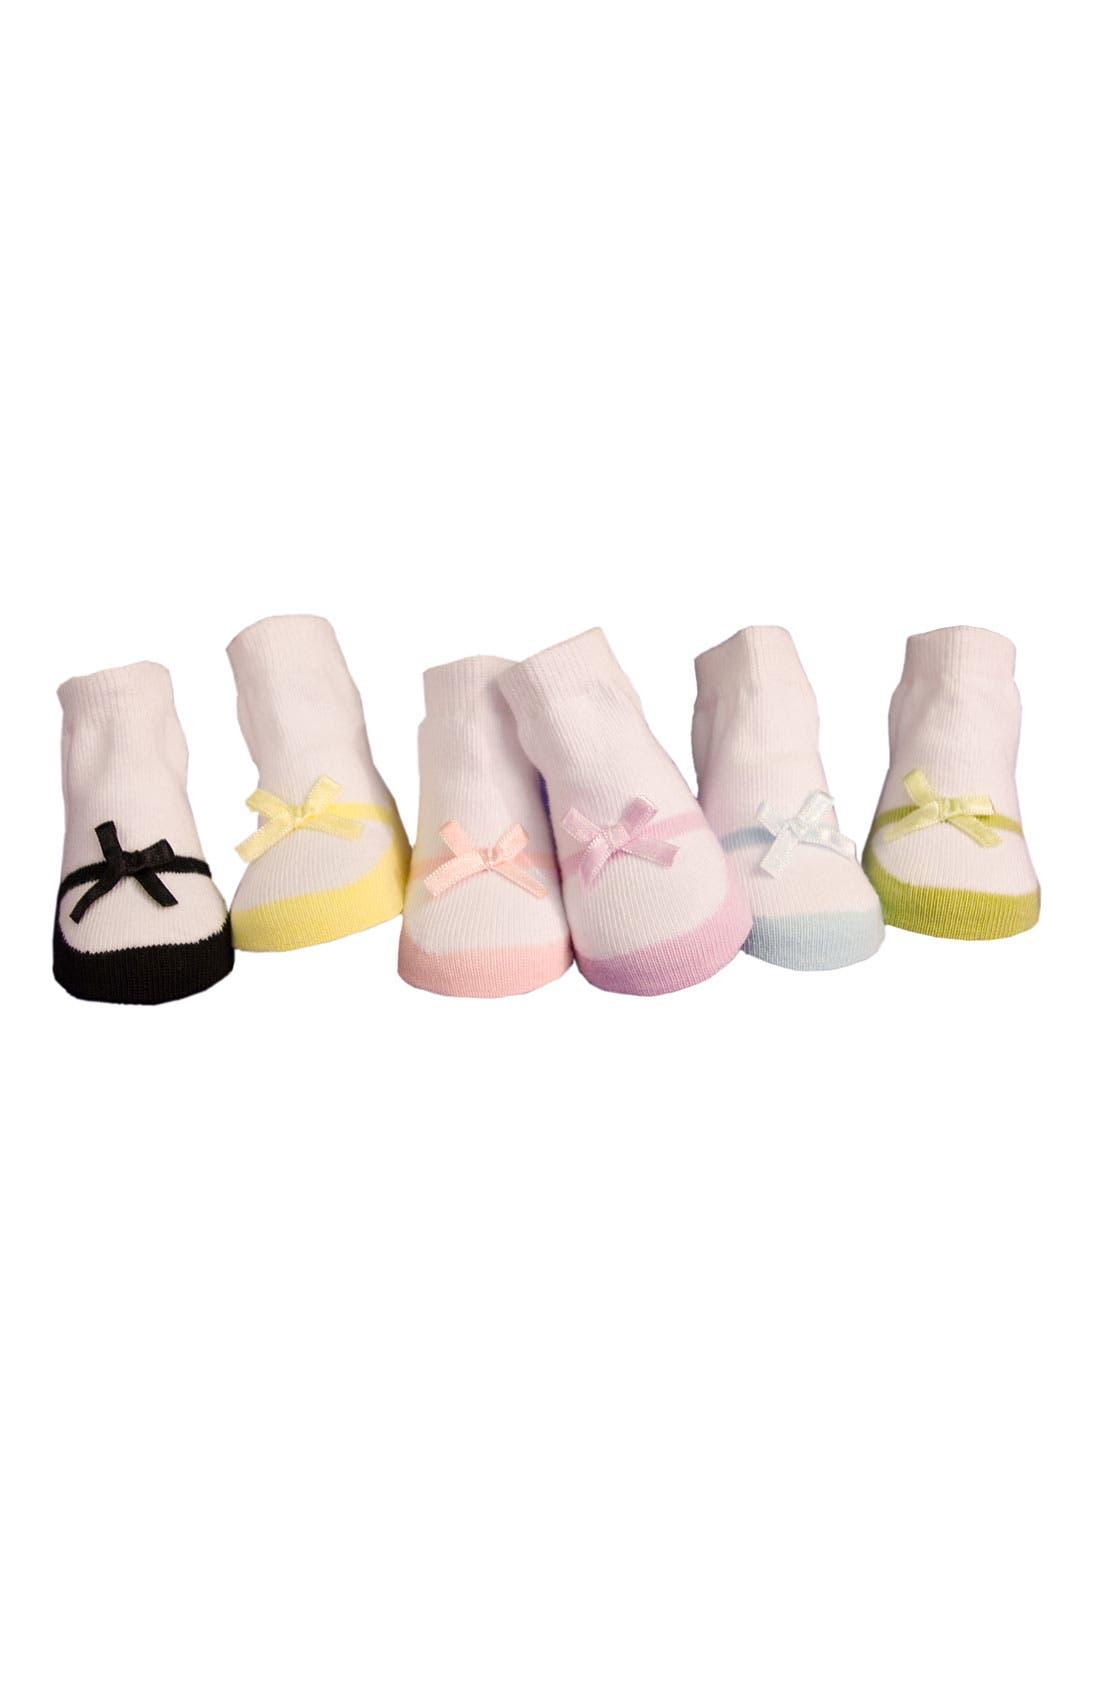 Socks Gift Set,                         Main,                         color, SUZY-B